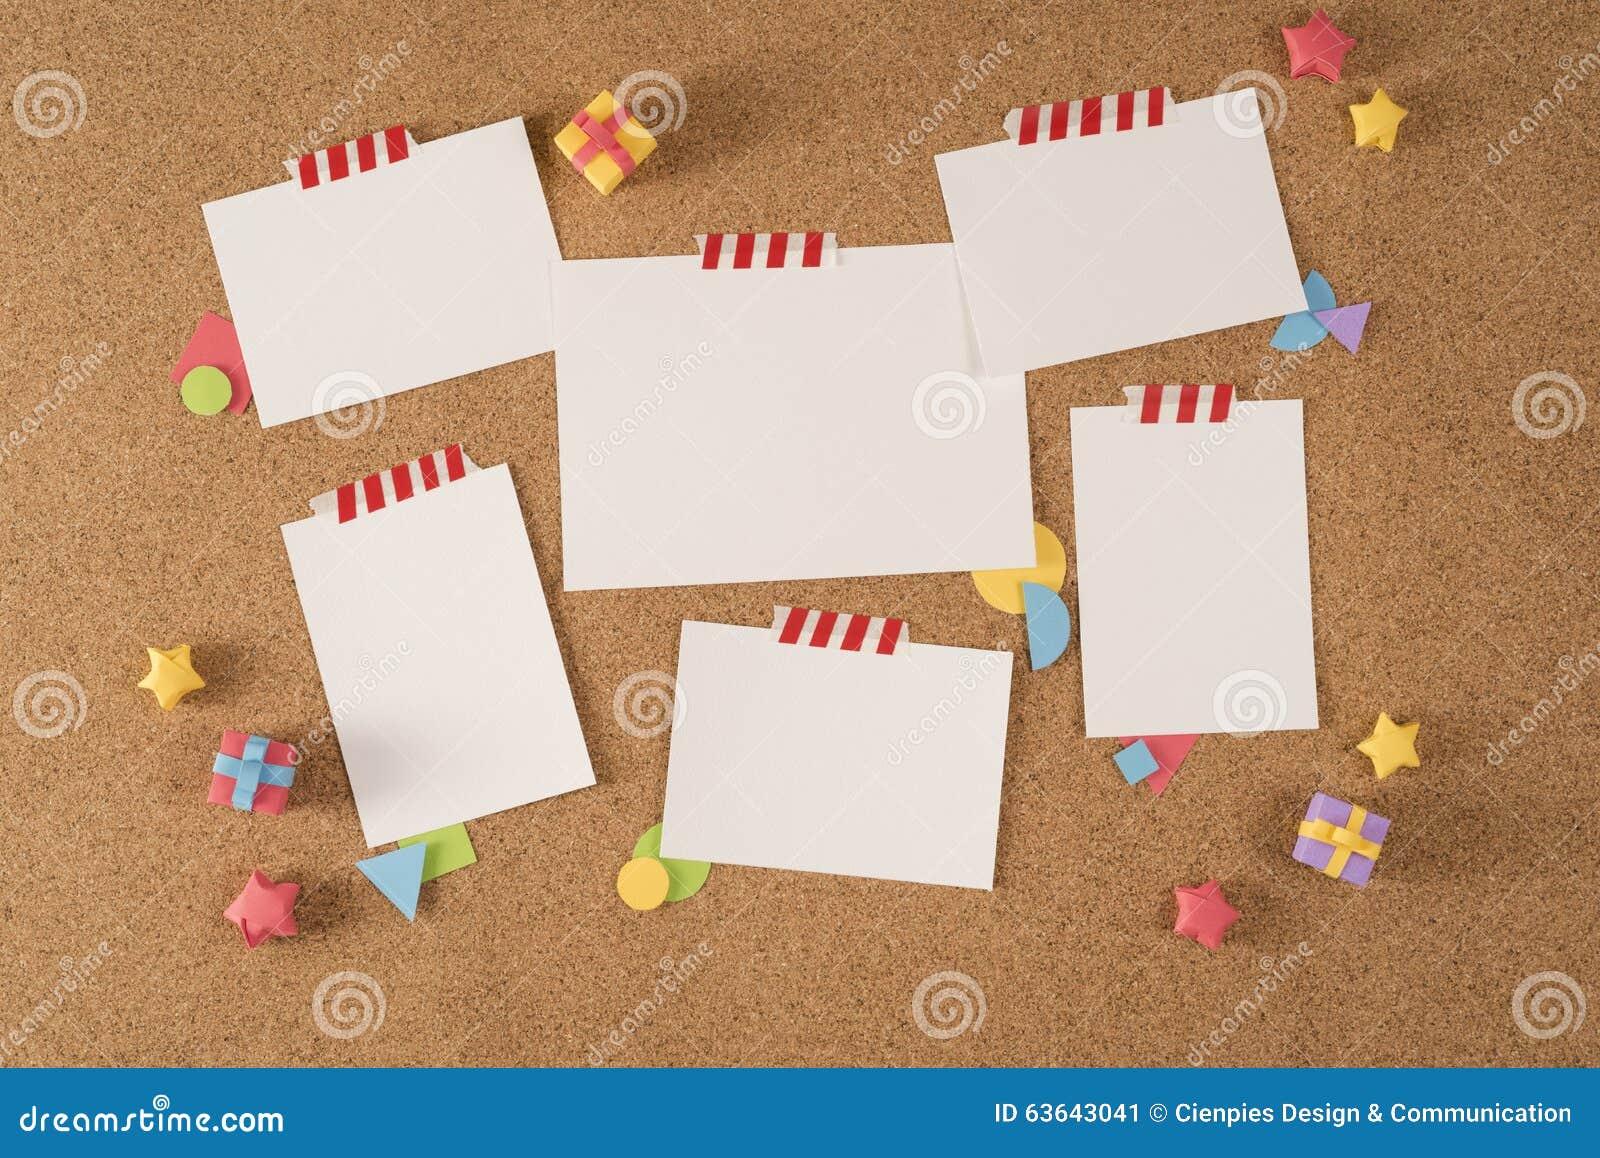 Бумажное портфолио шаблона извещении о пробочки доски офиса примечания